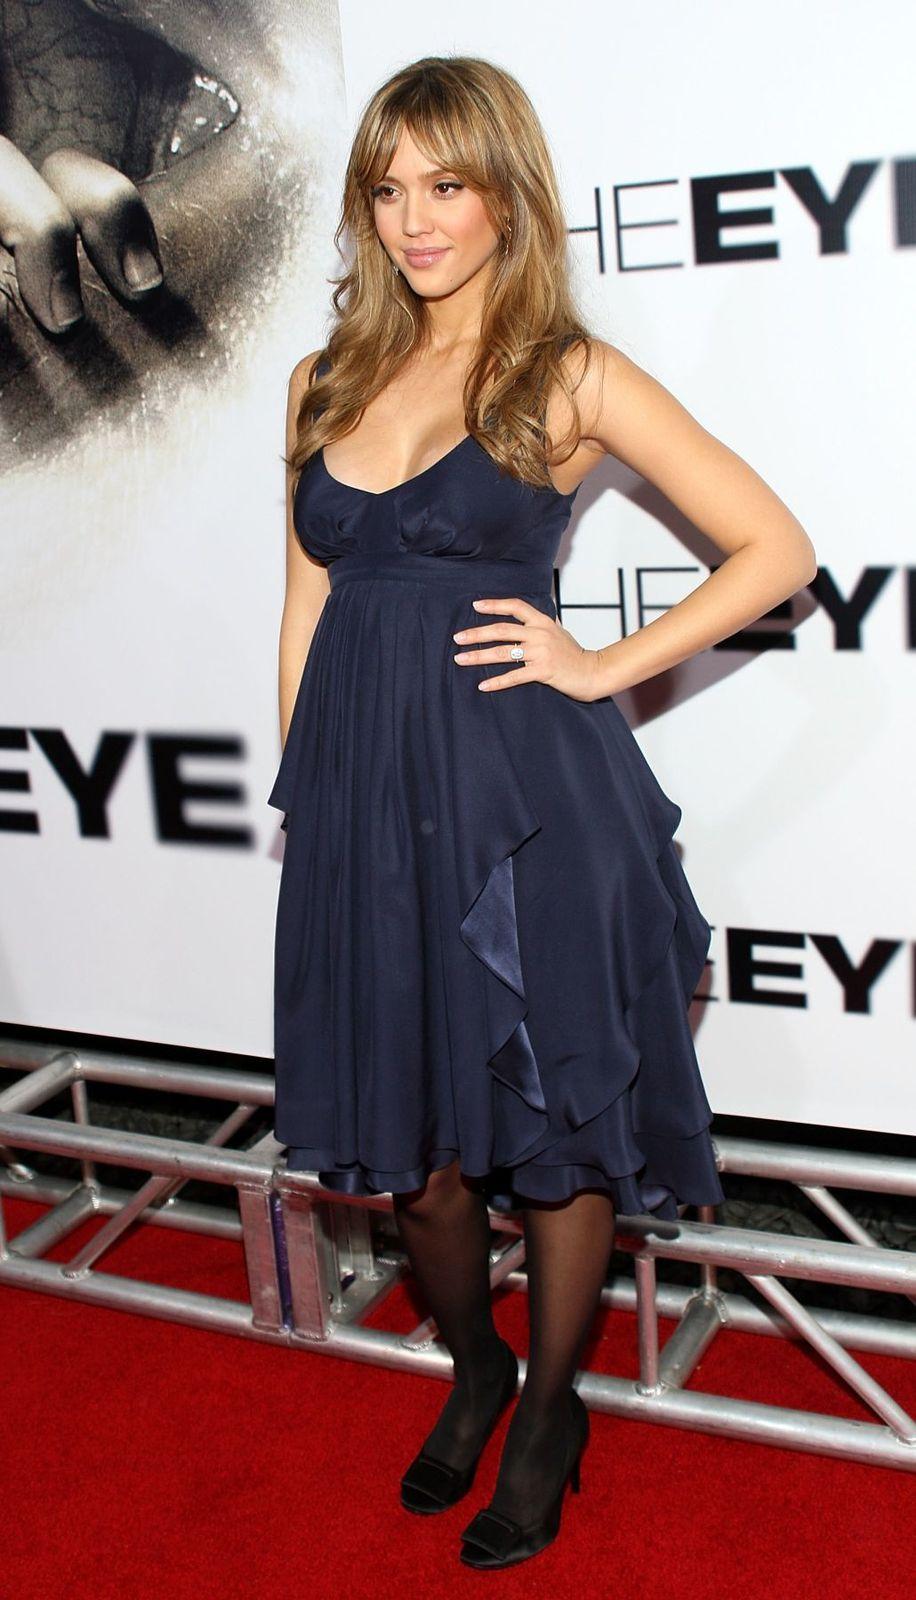 69756_Jessica_Alba-The_Eye_Premiere_31012008-8_123_506lo.jpg